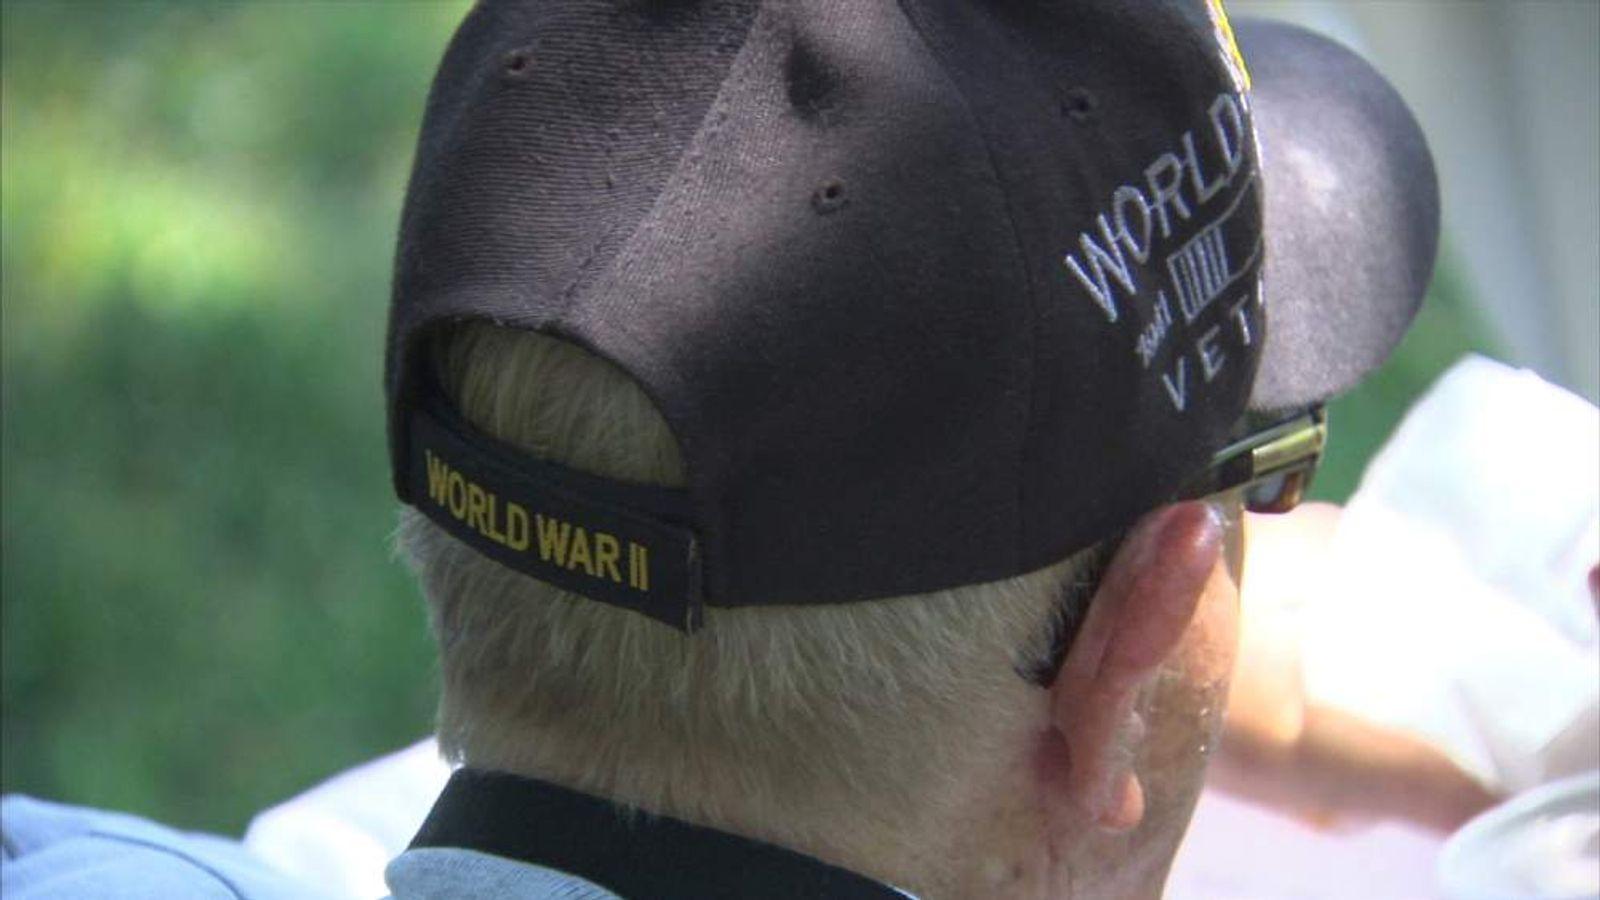 A US army veteran